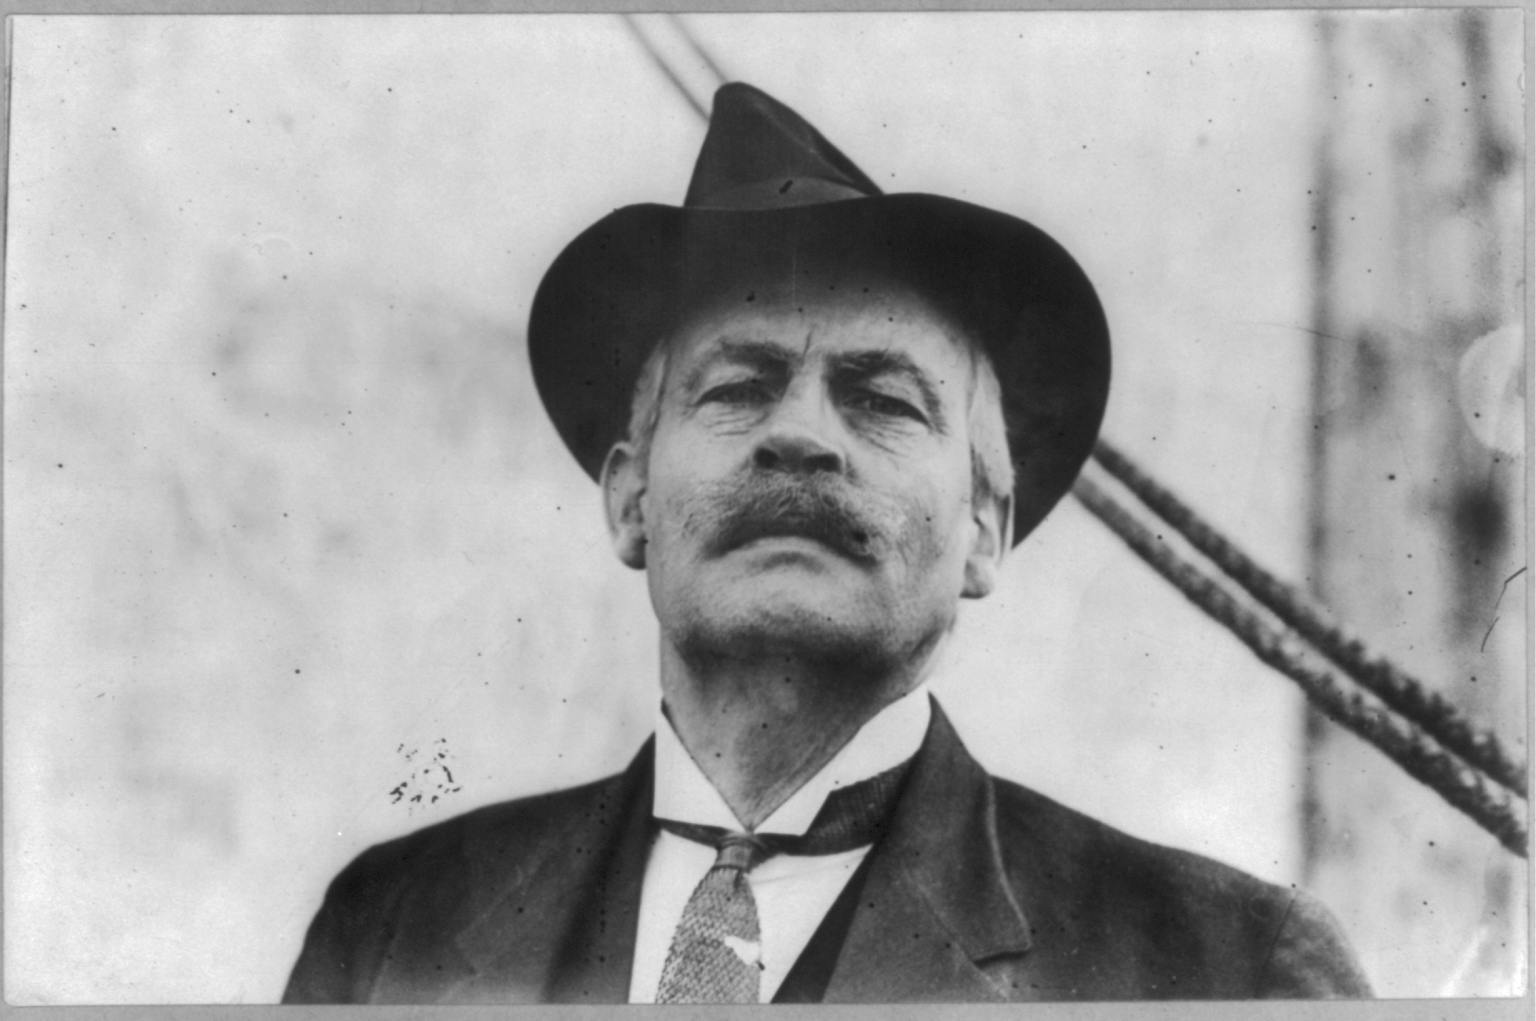 Walter Wellman